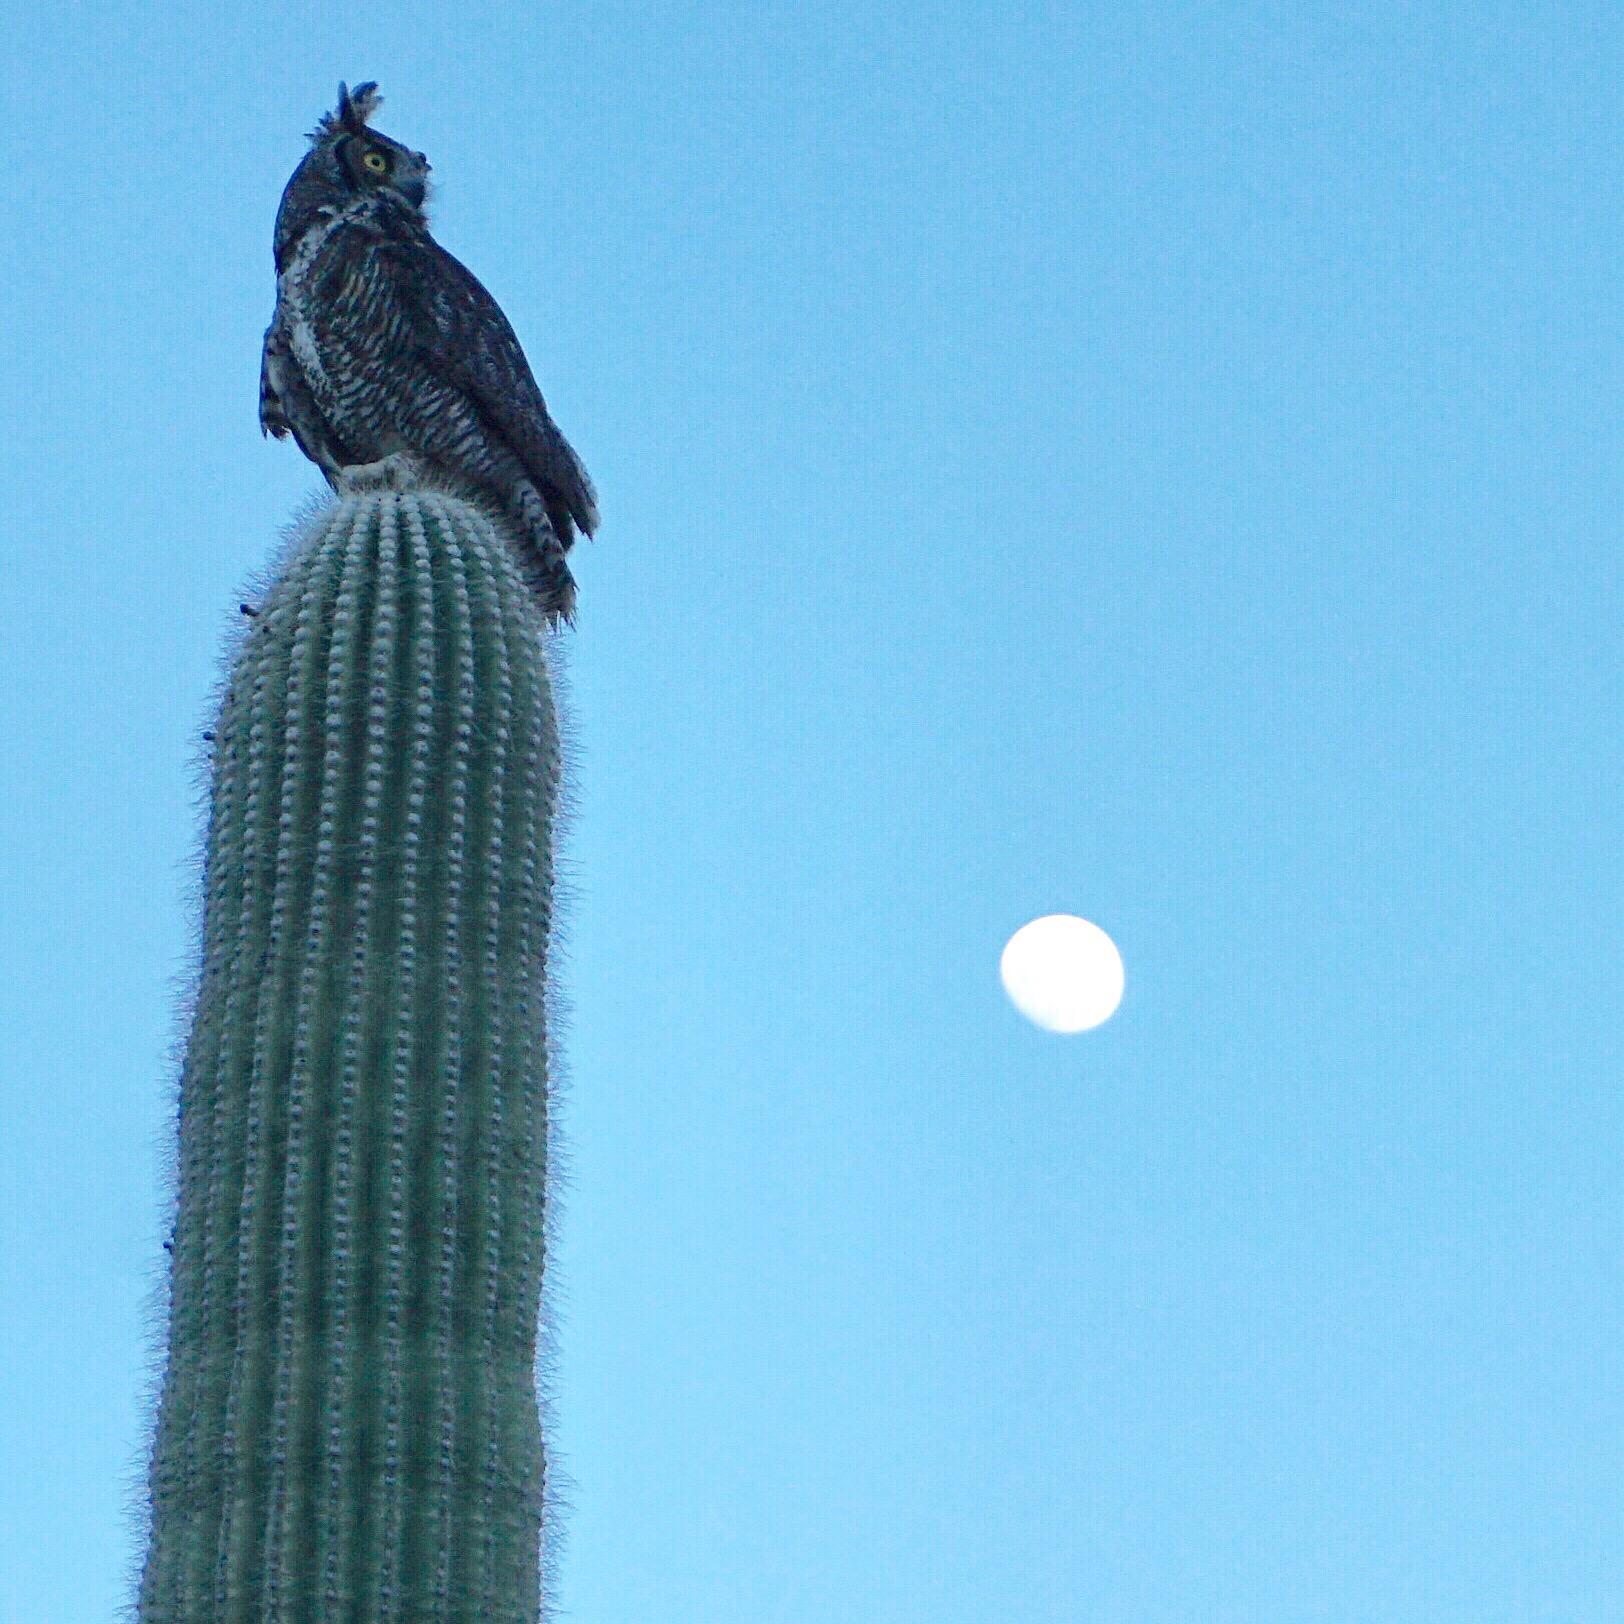 An owl sits atop a Saguaro cactus with the moon visible